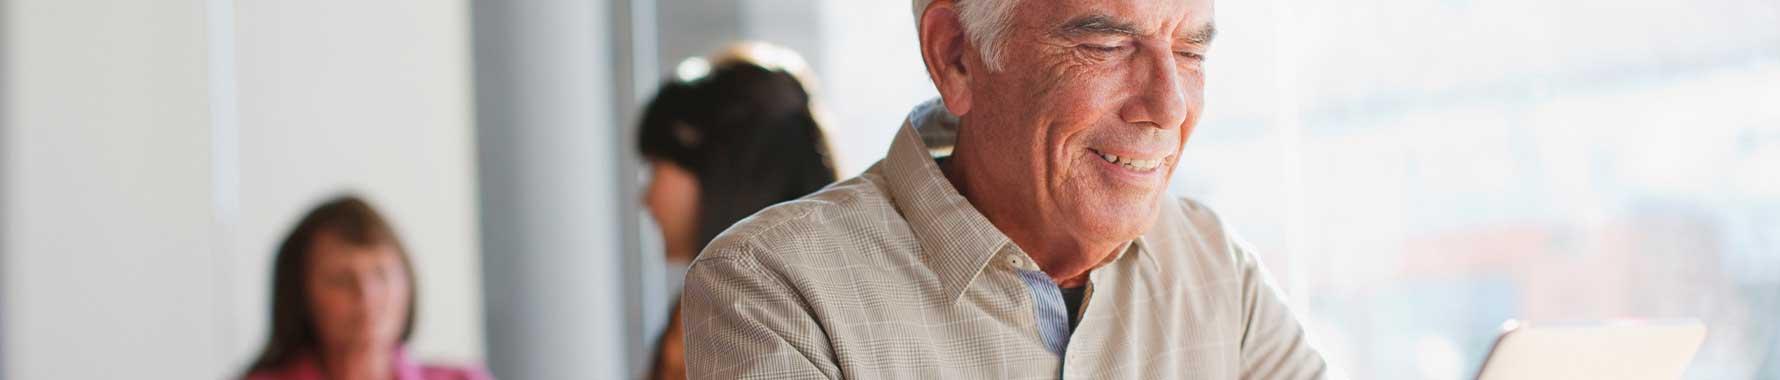 An elderly gentlemen looking at a tablet